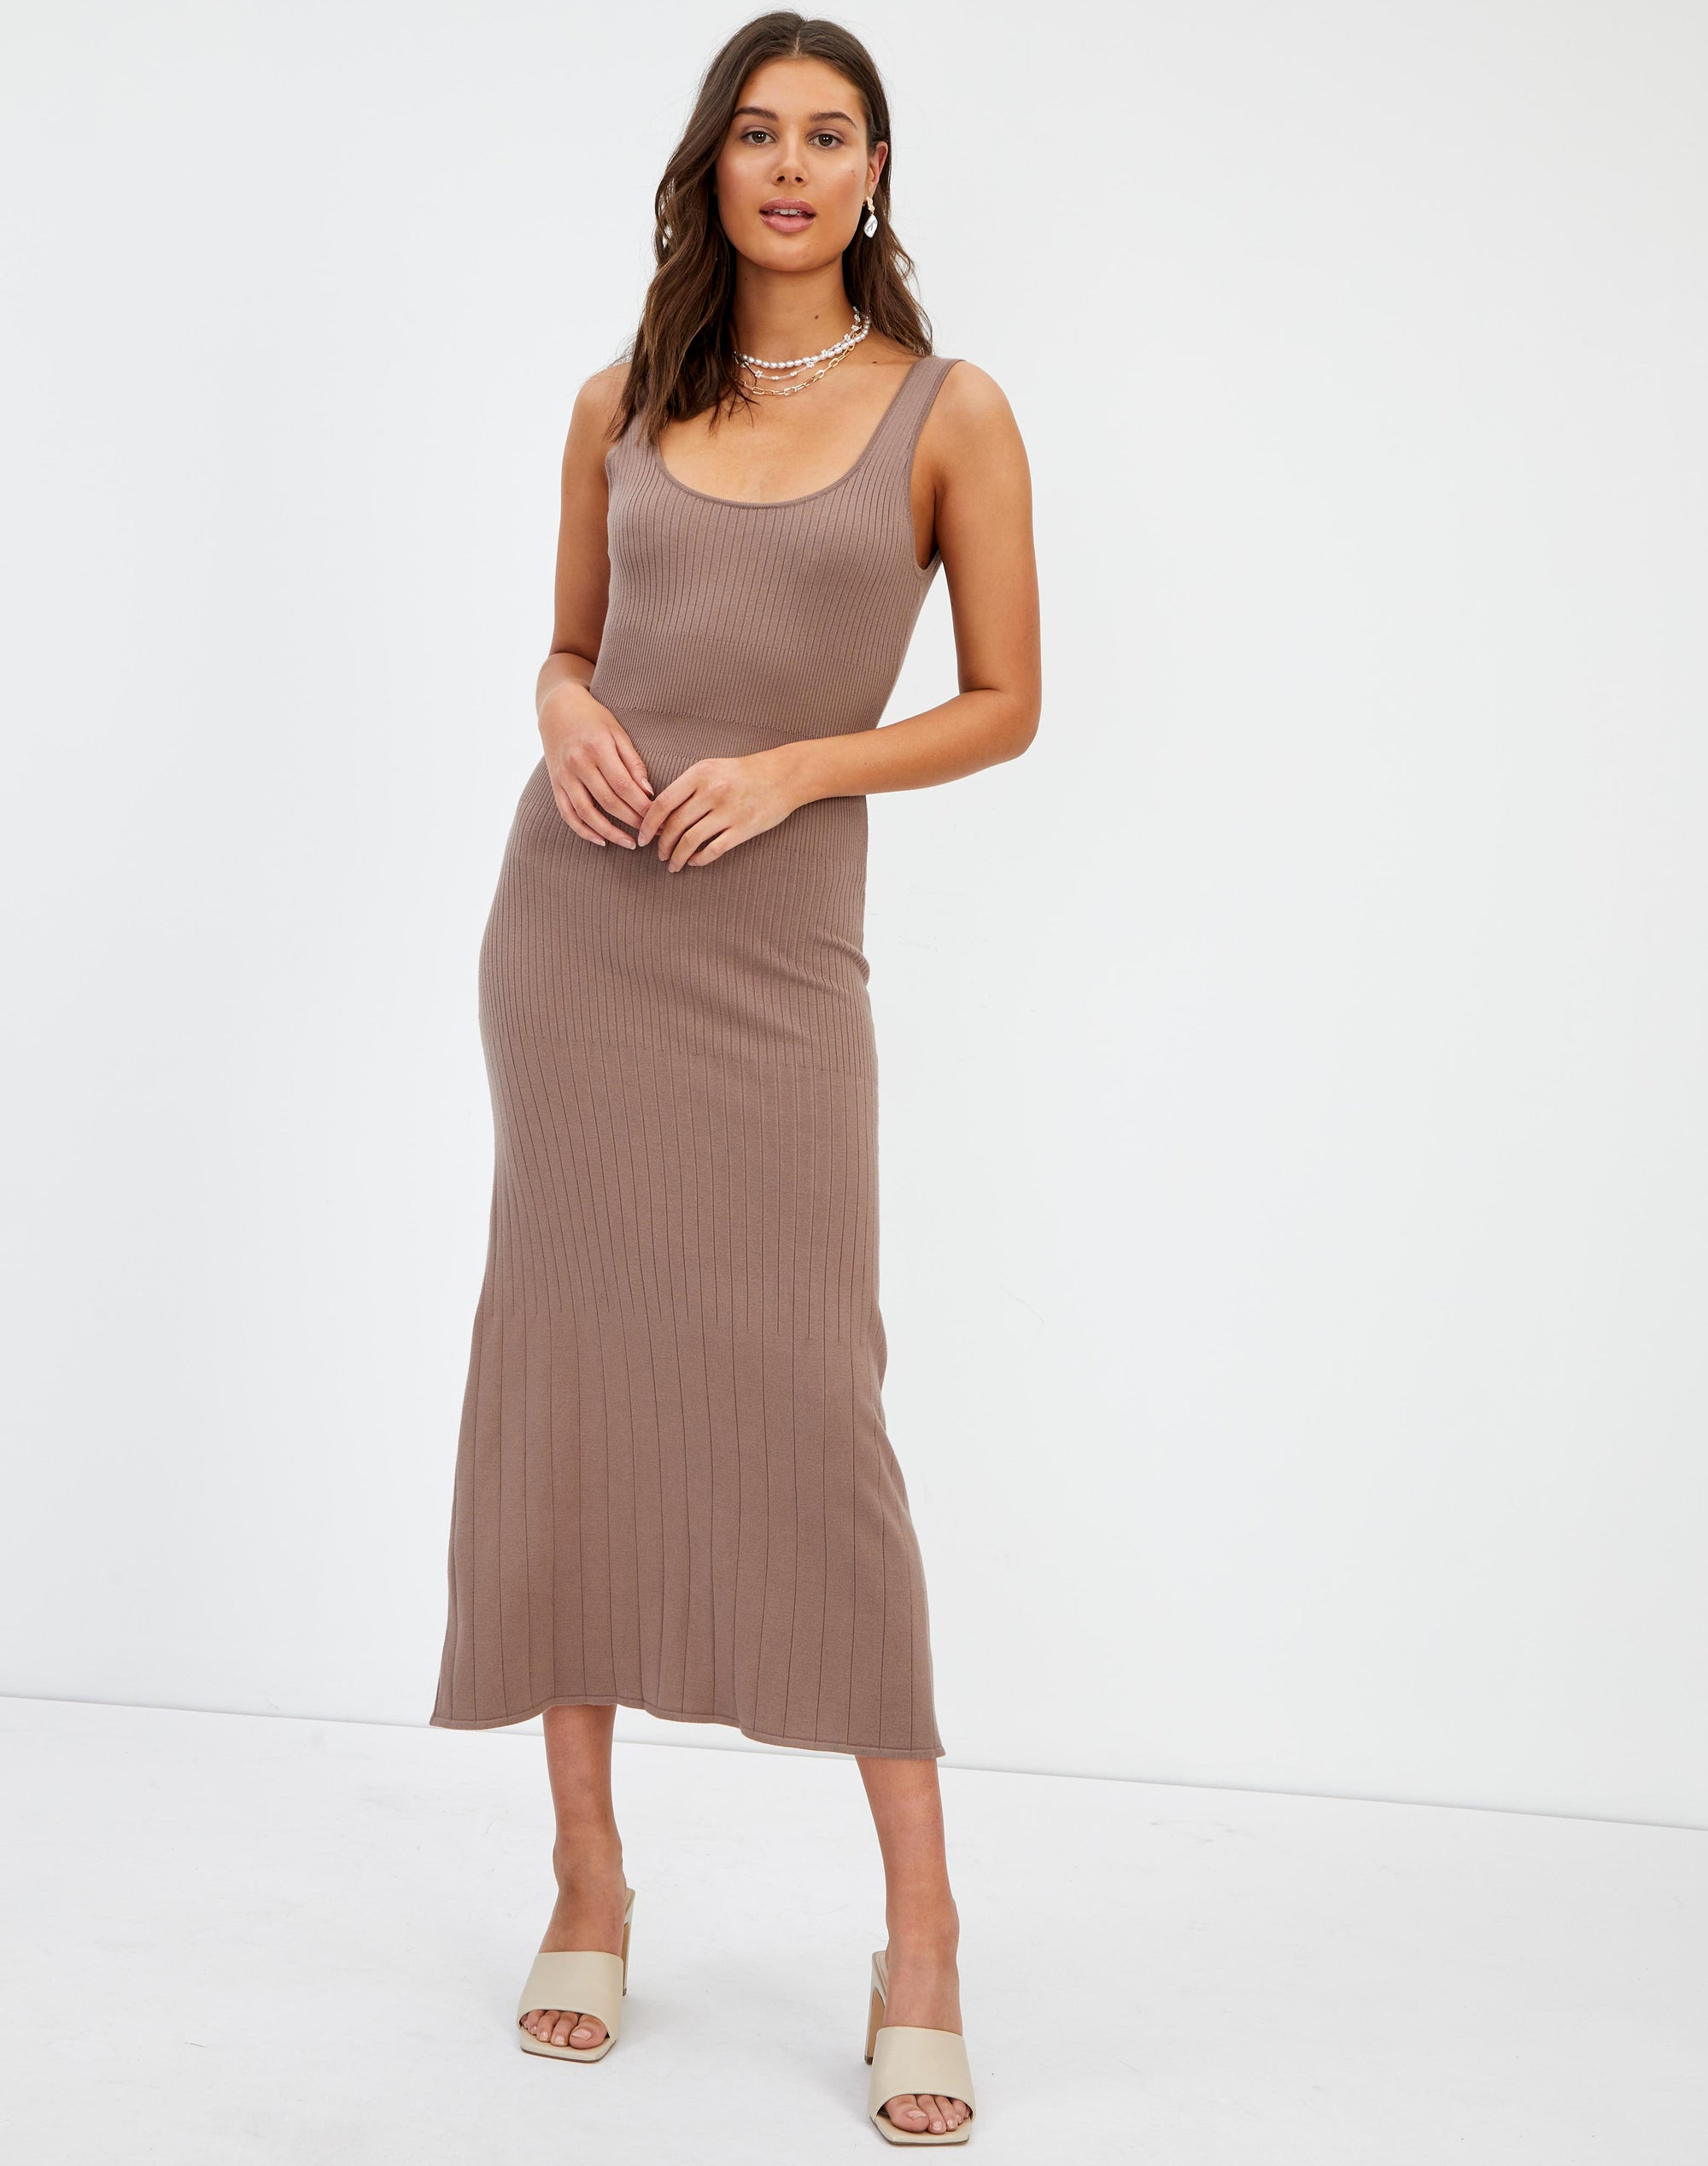 Backless Ribbed Knit Midi Dress